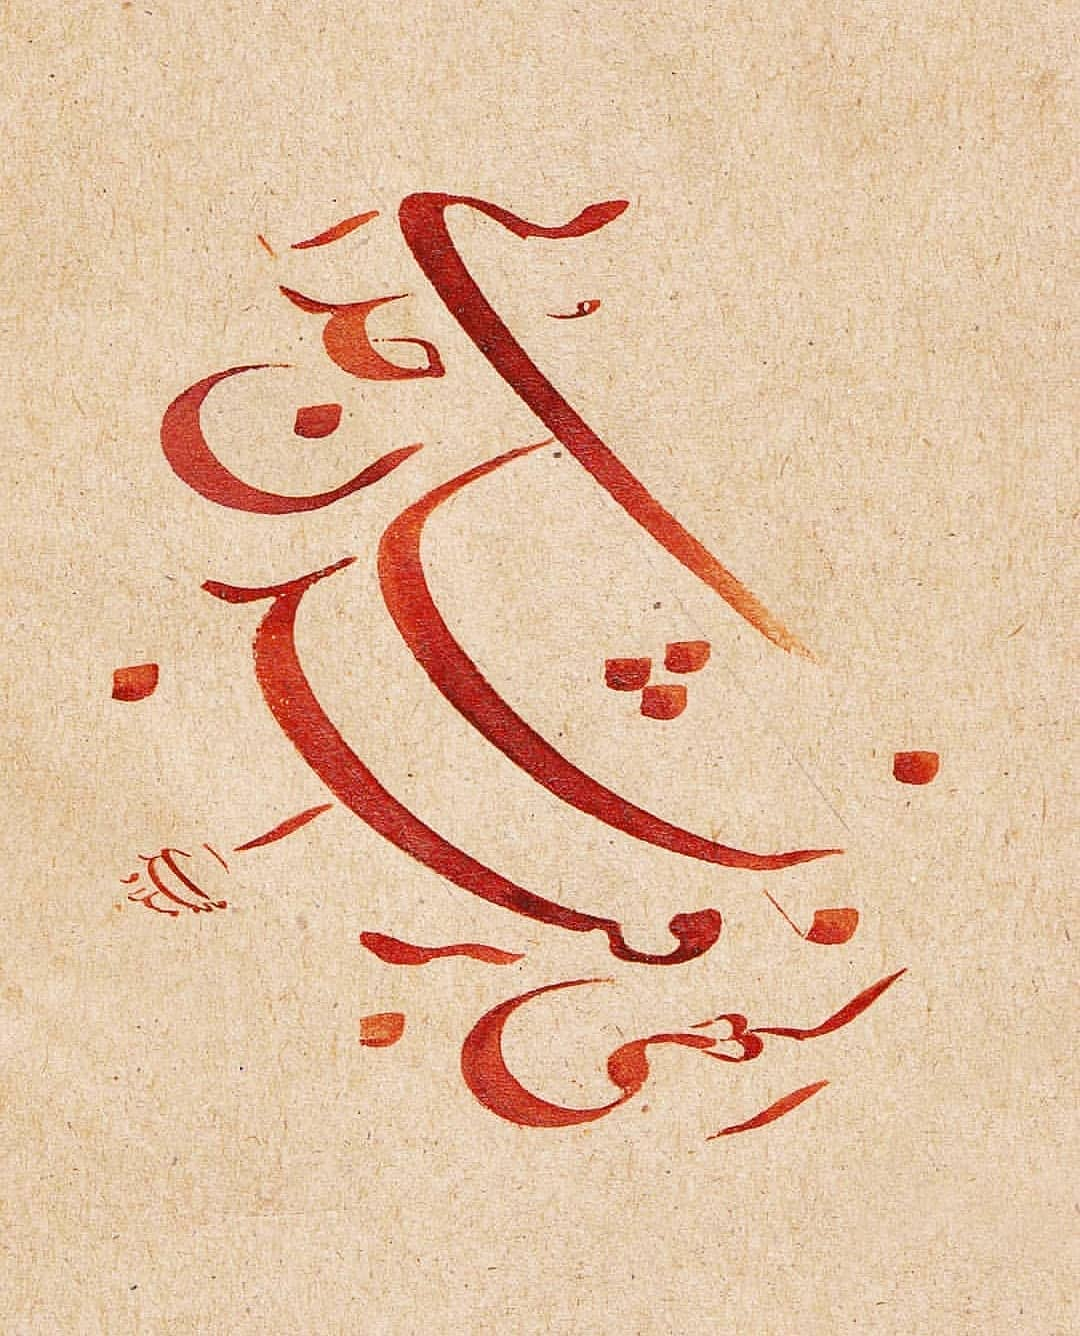 Farisi/Nasta'liq khatestan  ﷽ الهی برافتد نشان جدایی . #خطستان  @khatestan #خط_خودکاری#خط_خودکاری_نوین#خطاط… 720